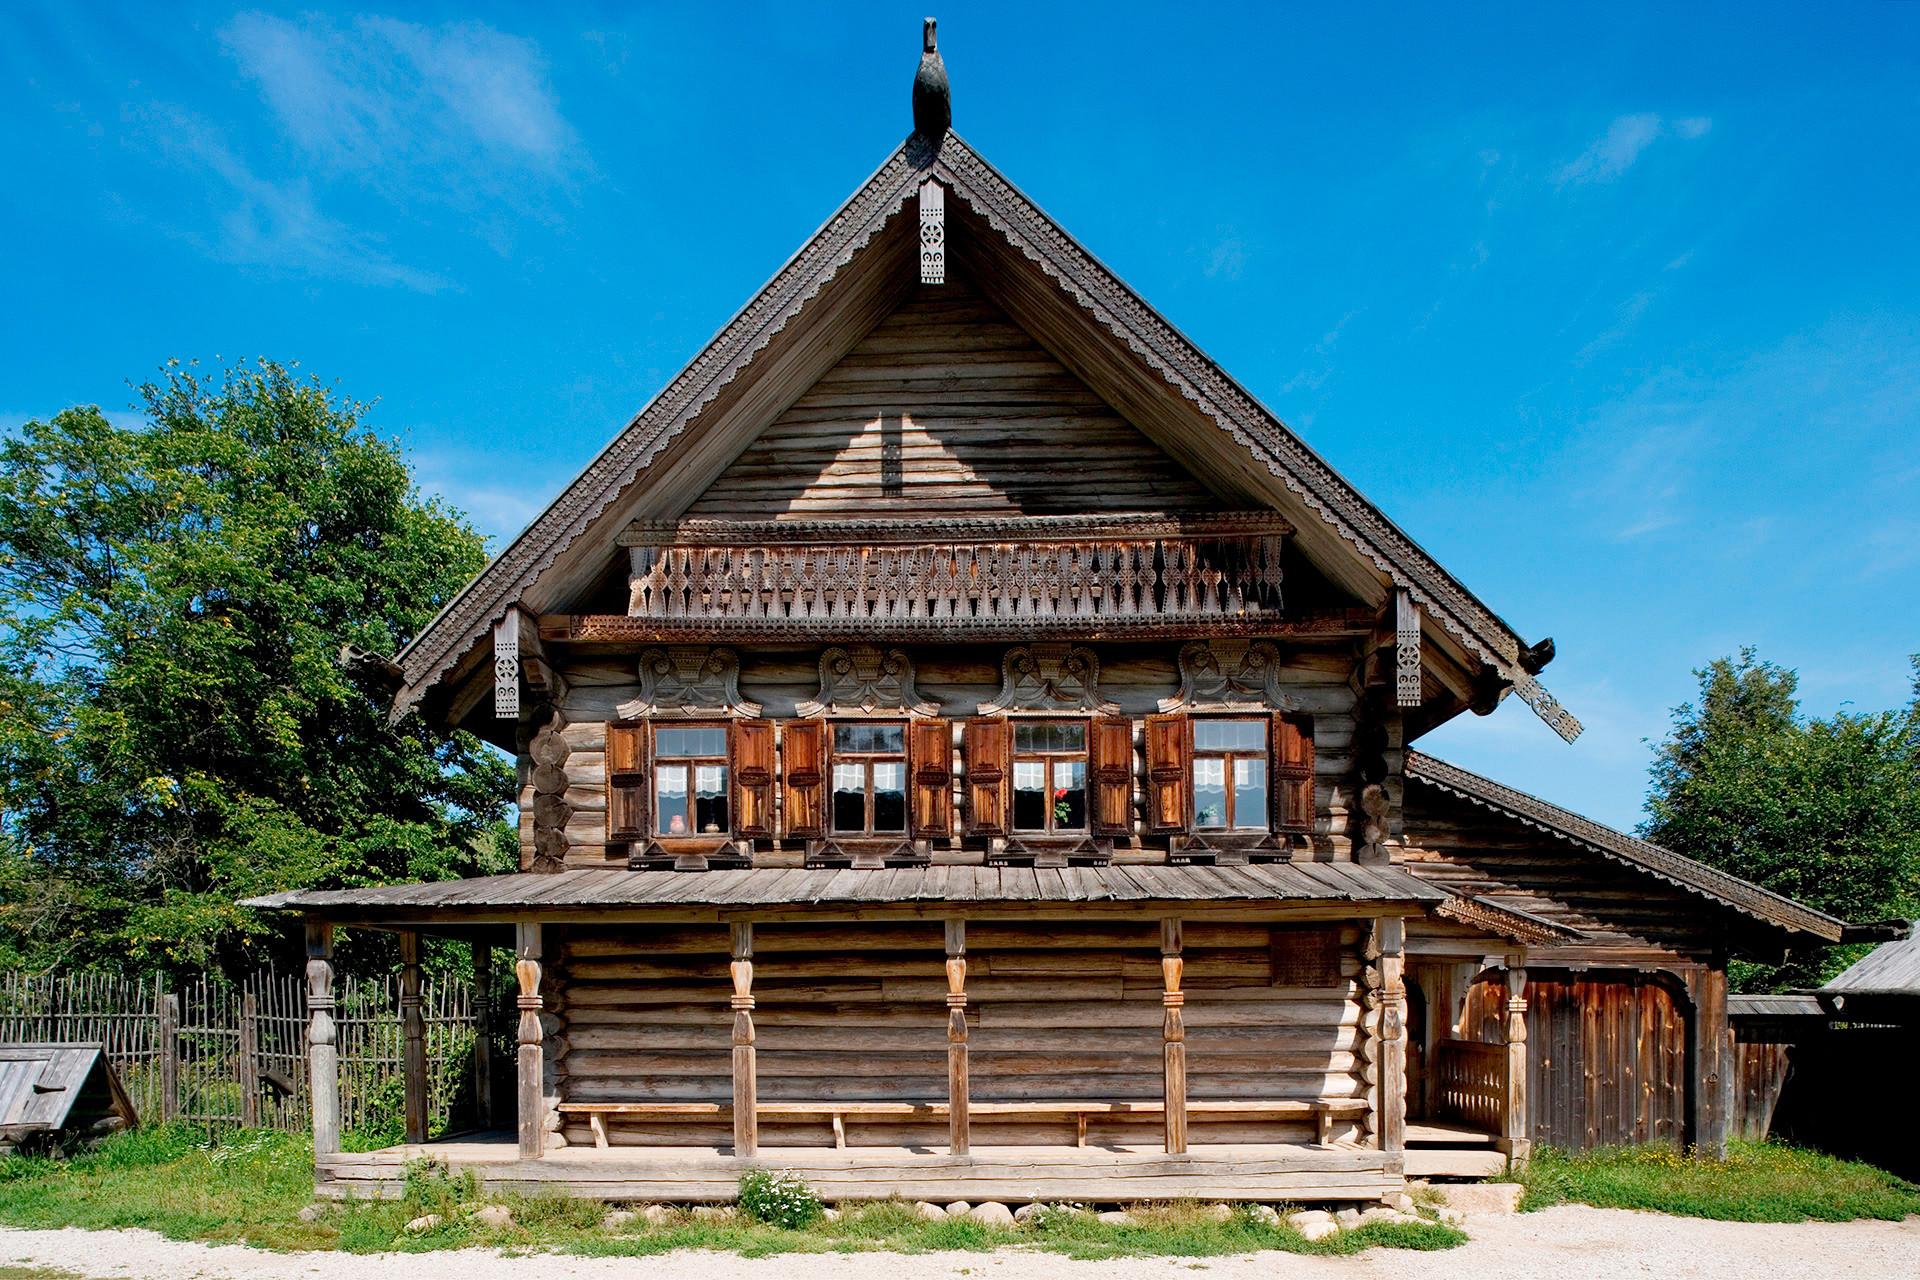 7 Tipos Diferentes De Vivienda Tradicional Rusa Fotos Russia